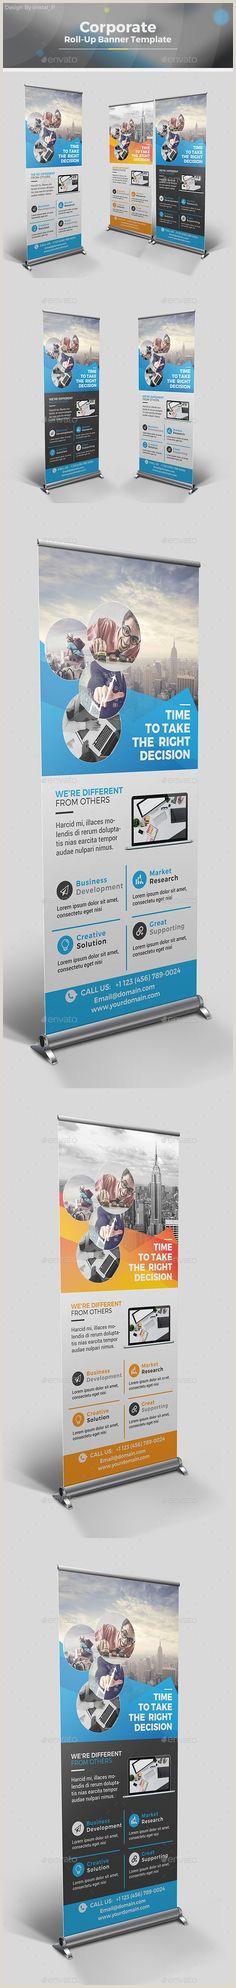 Standard Pop Up Banner Sizes Portable Displays